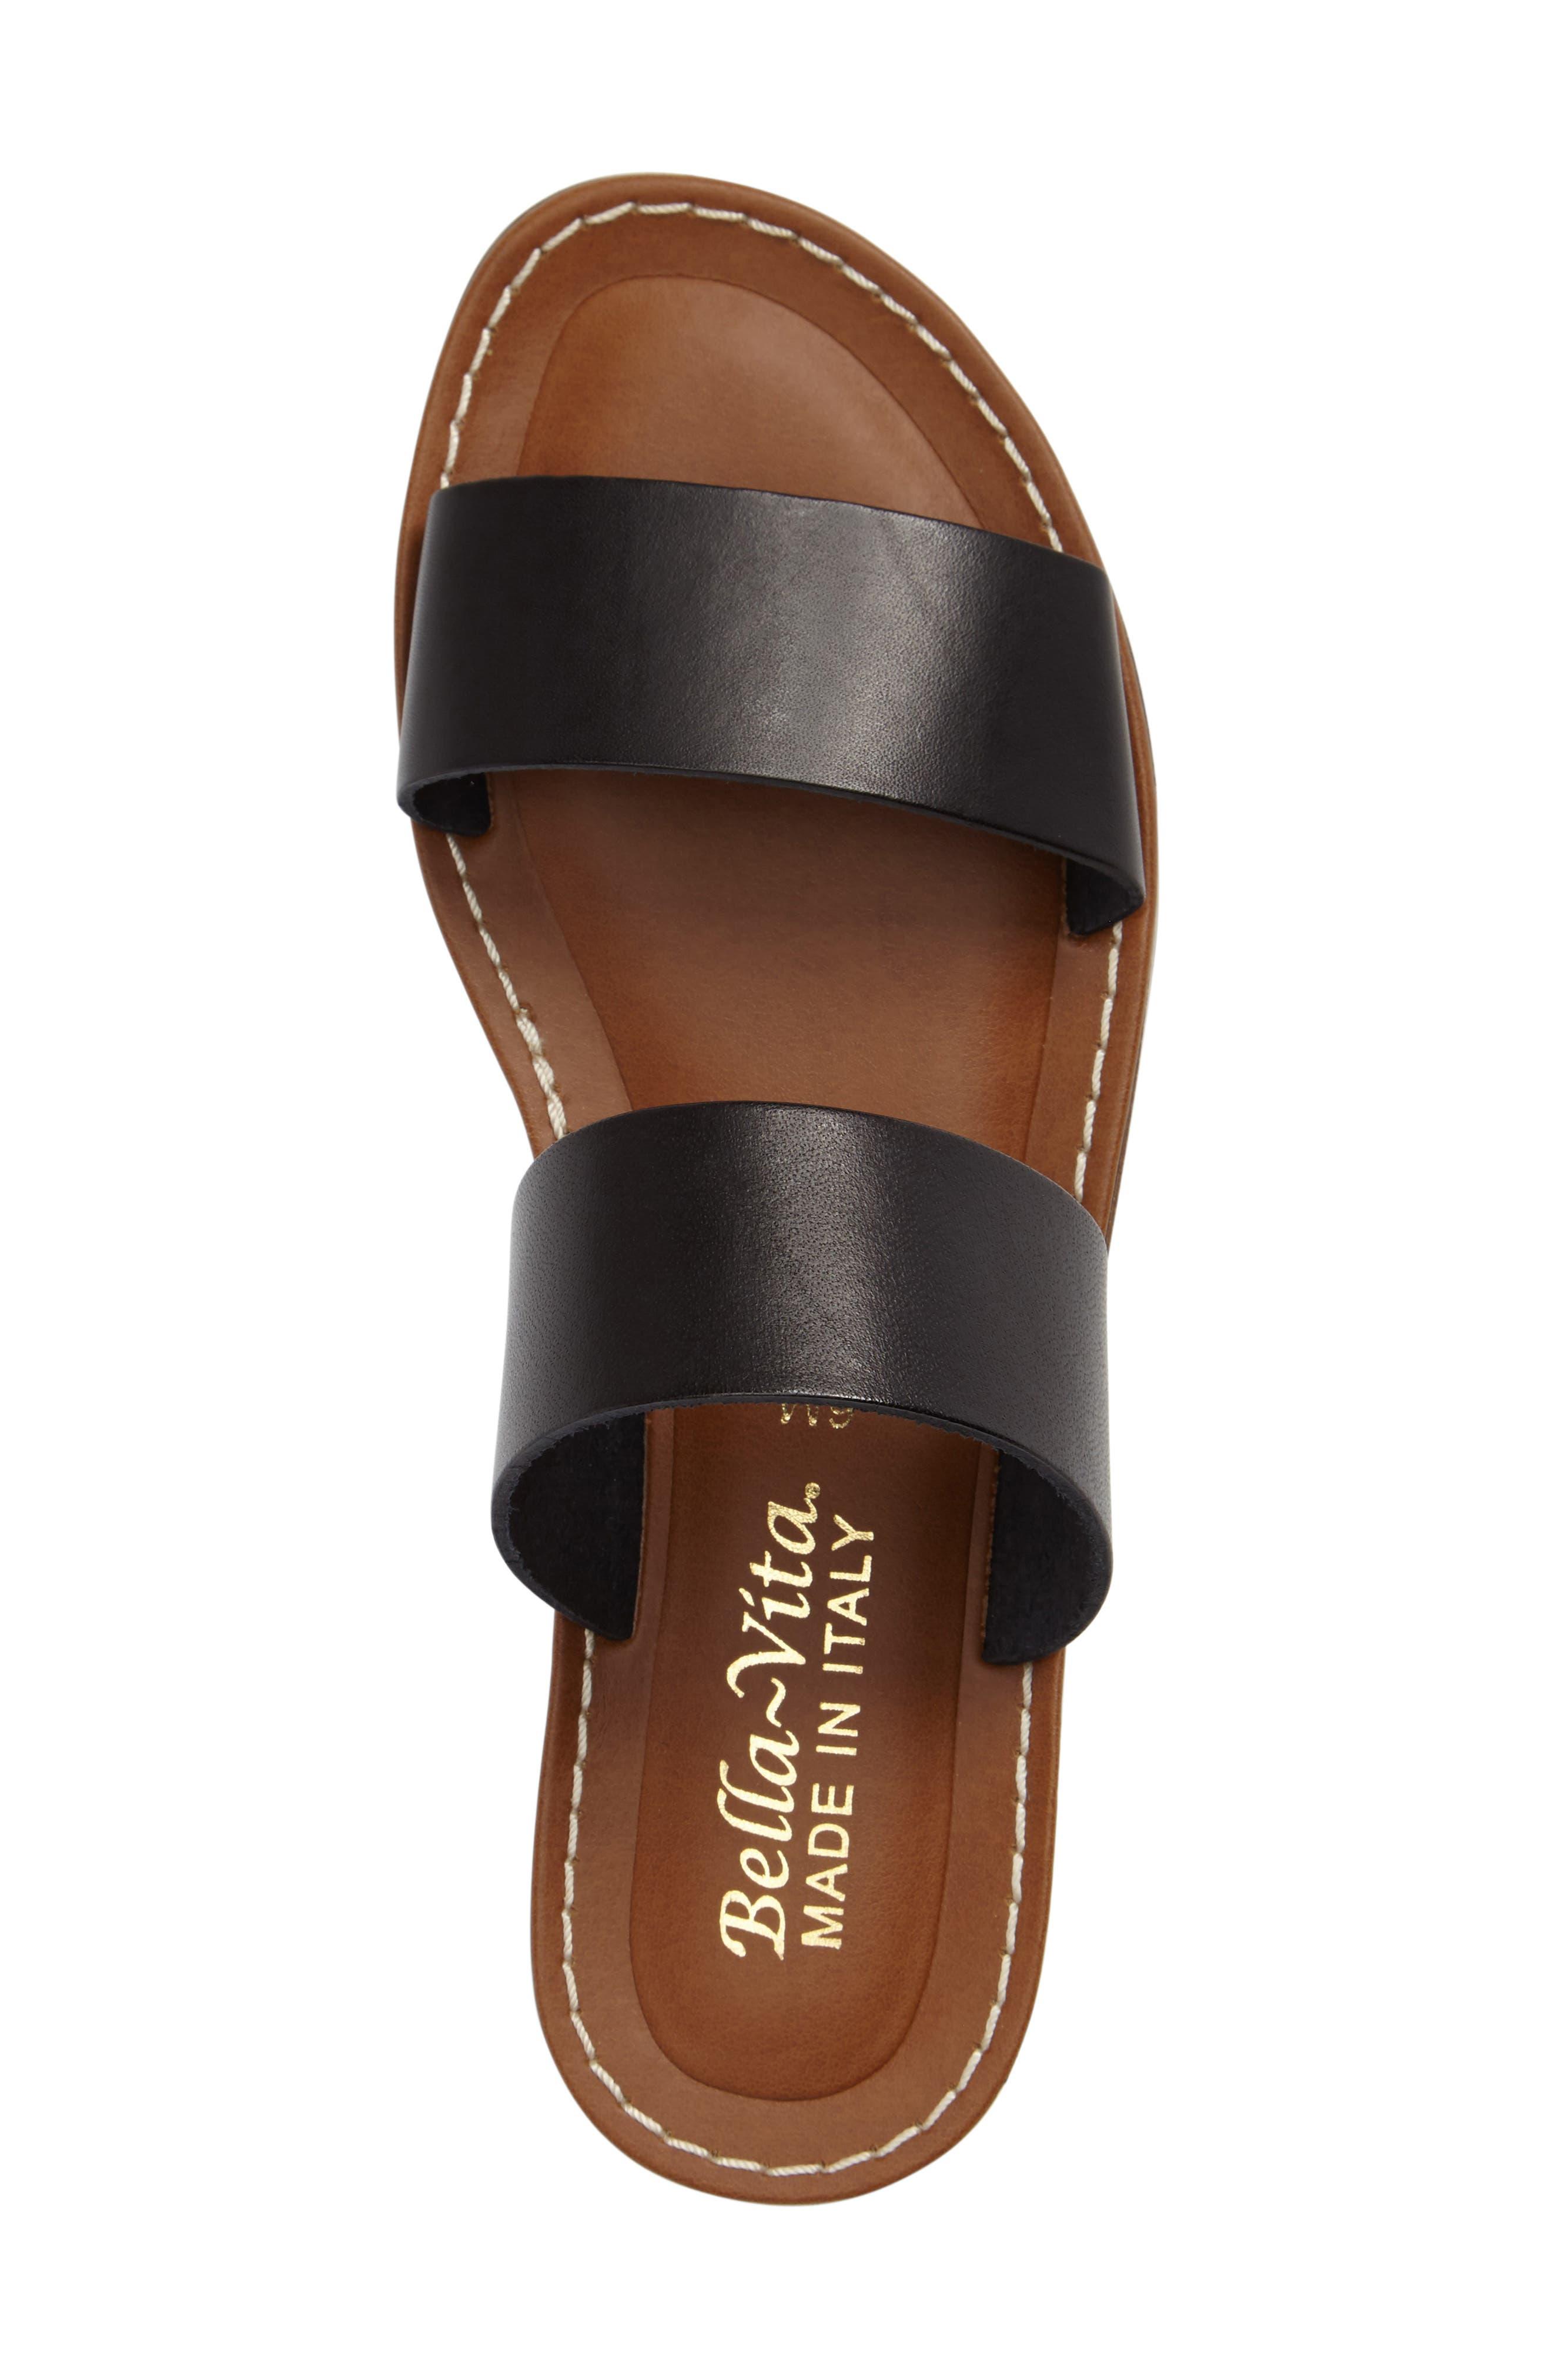 BELLA VITA, Imo Slide Sandal, Alternate thumbnail 3, color, BLACK LEATHER